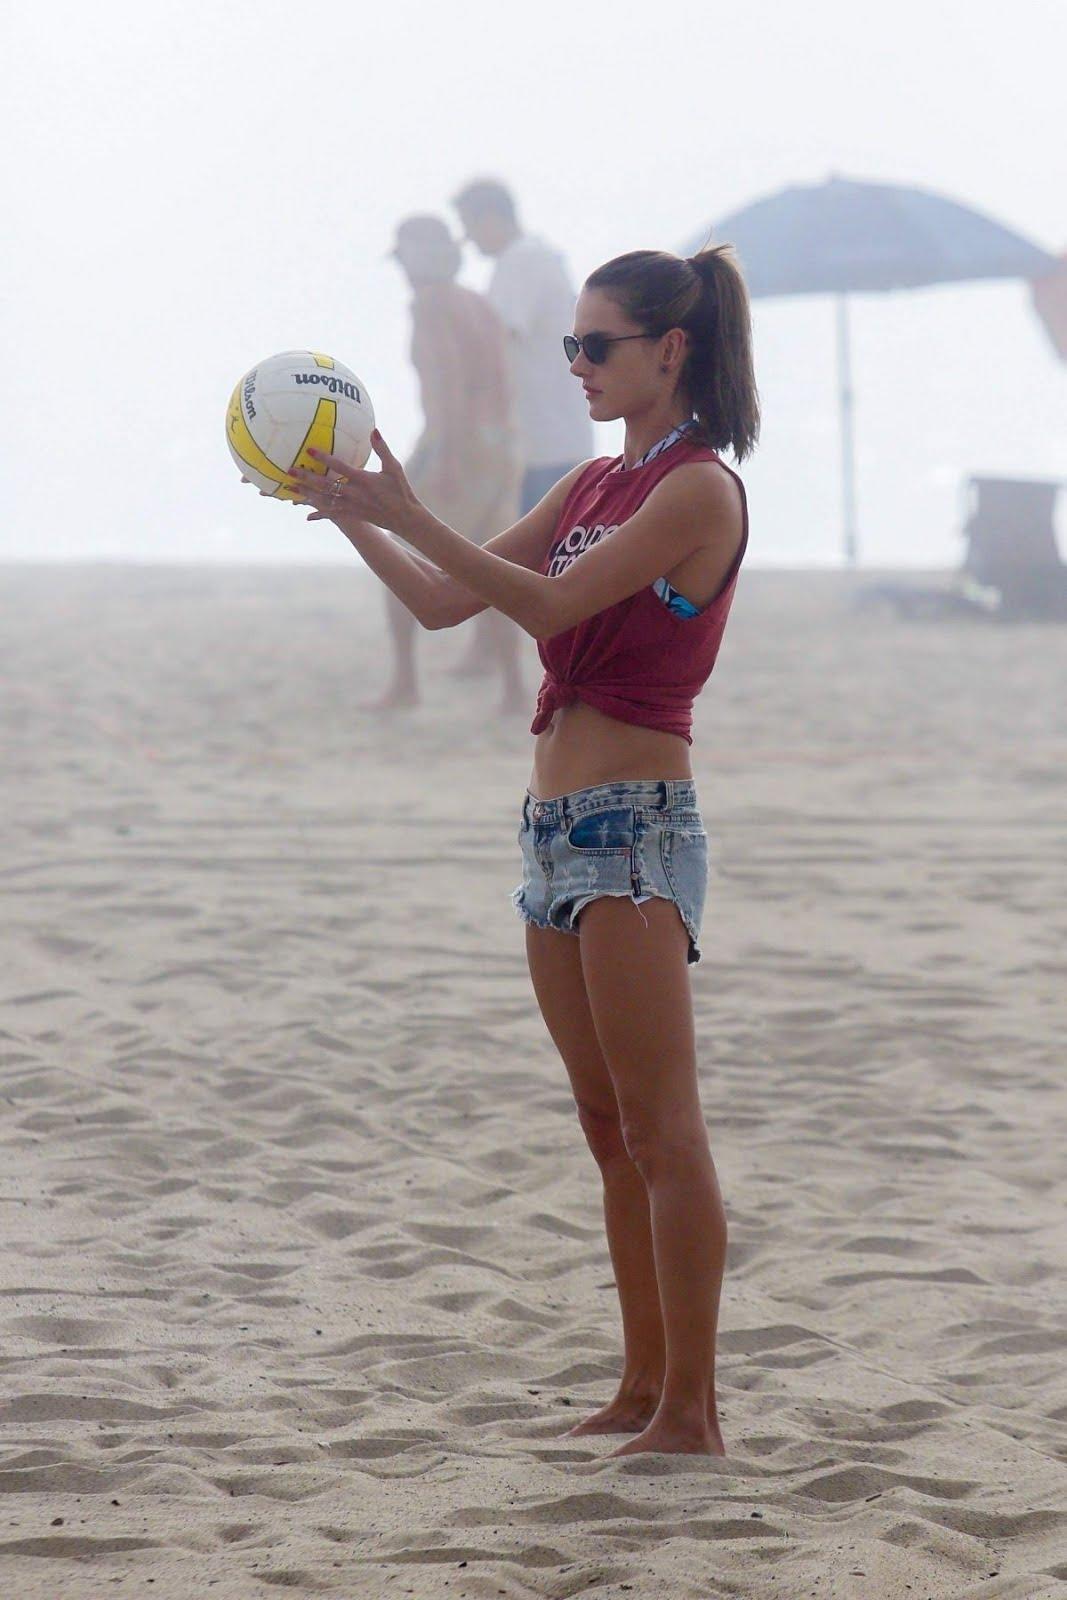 Victoria's Secret model Alessandra Ambrosio Playing Volleyball on the Beach in Santa Monica